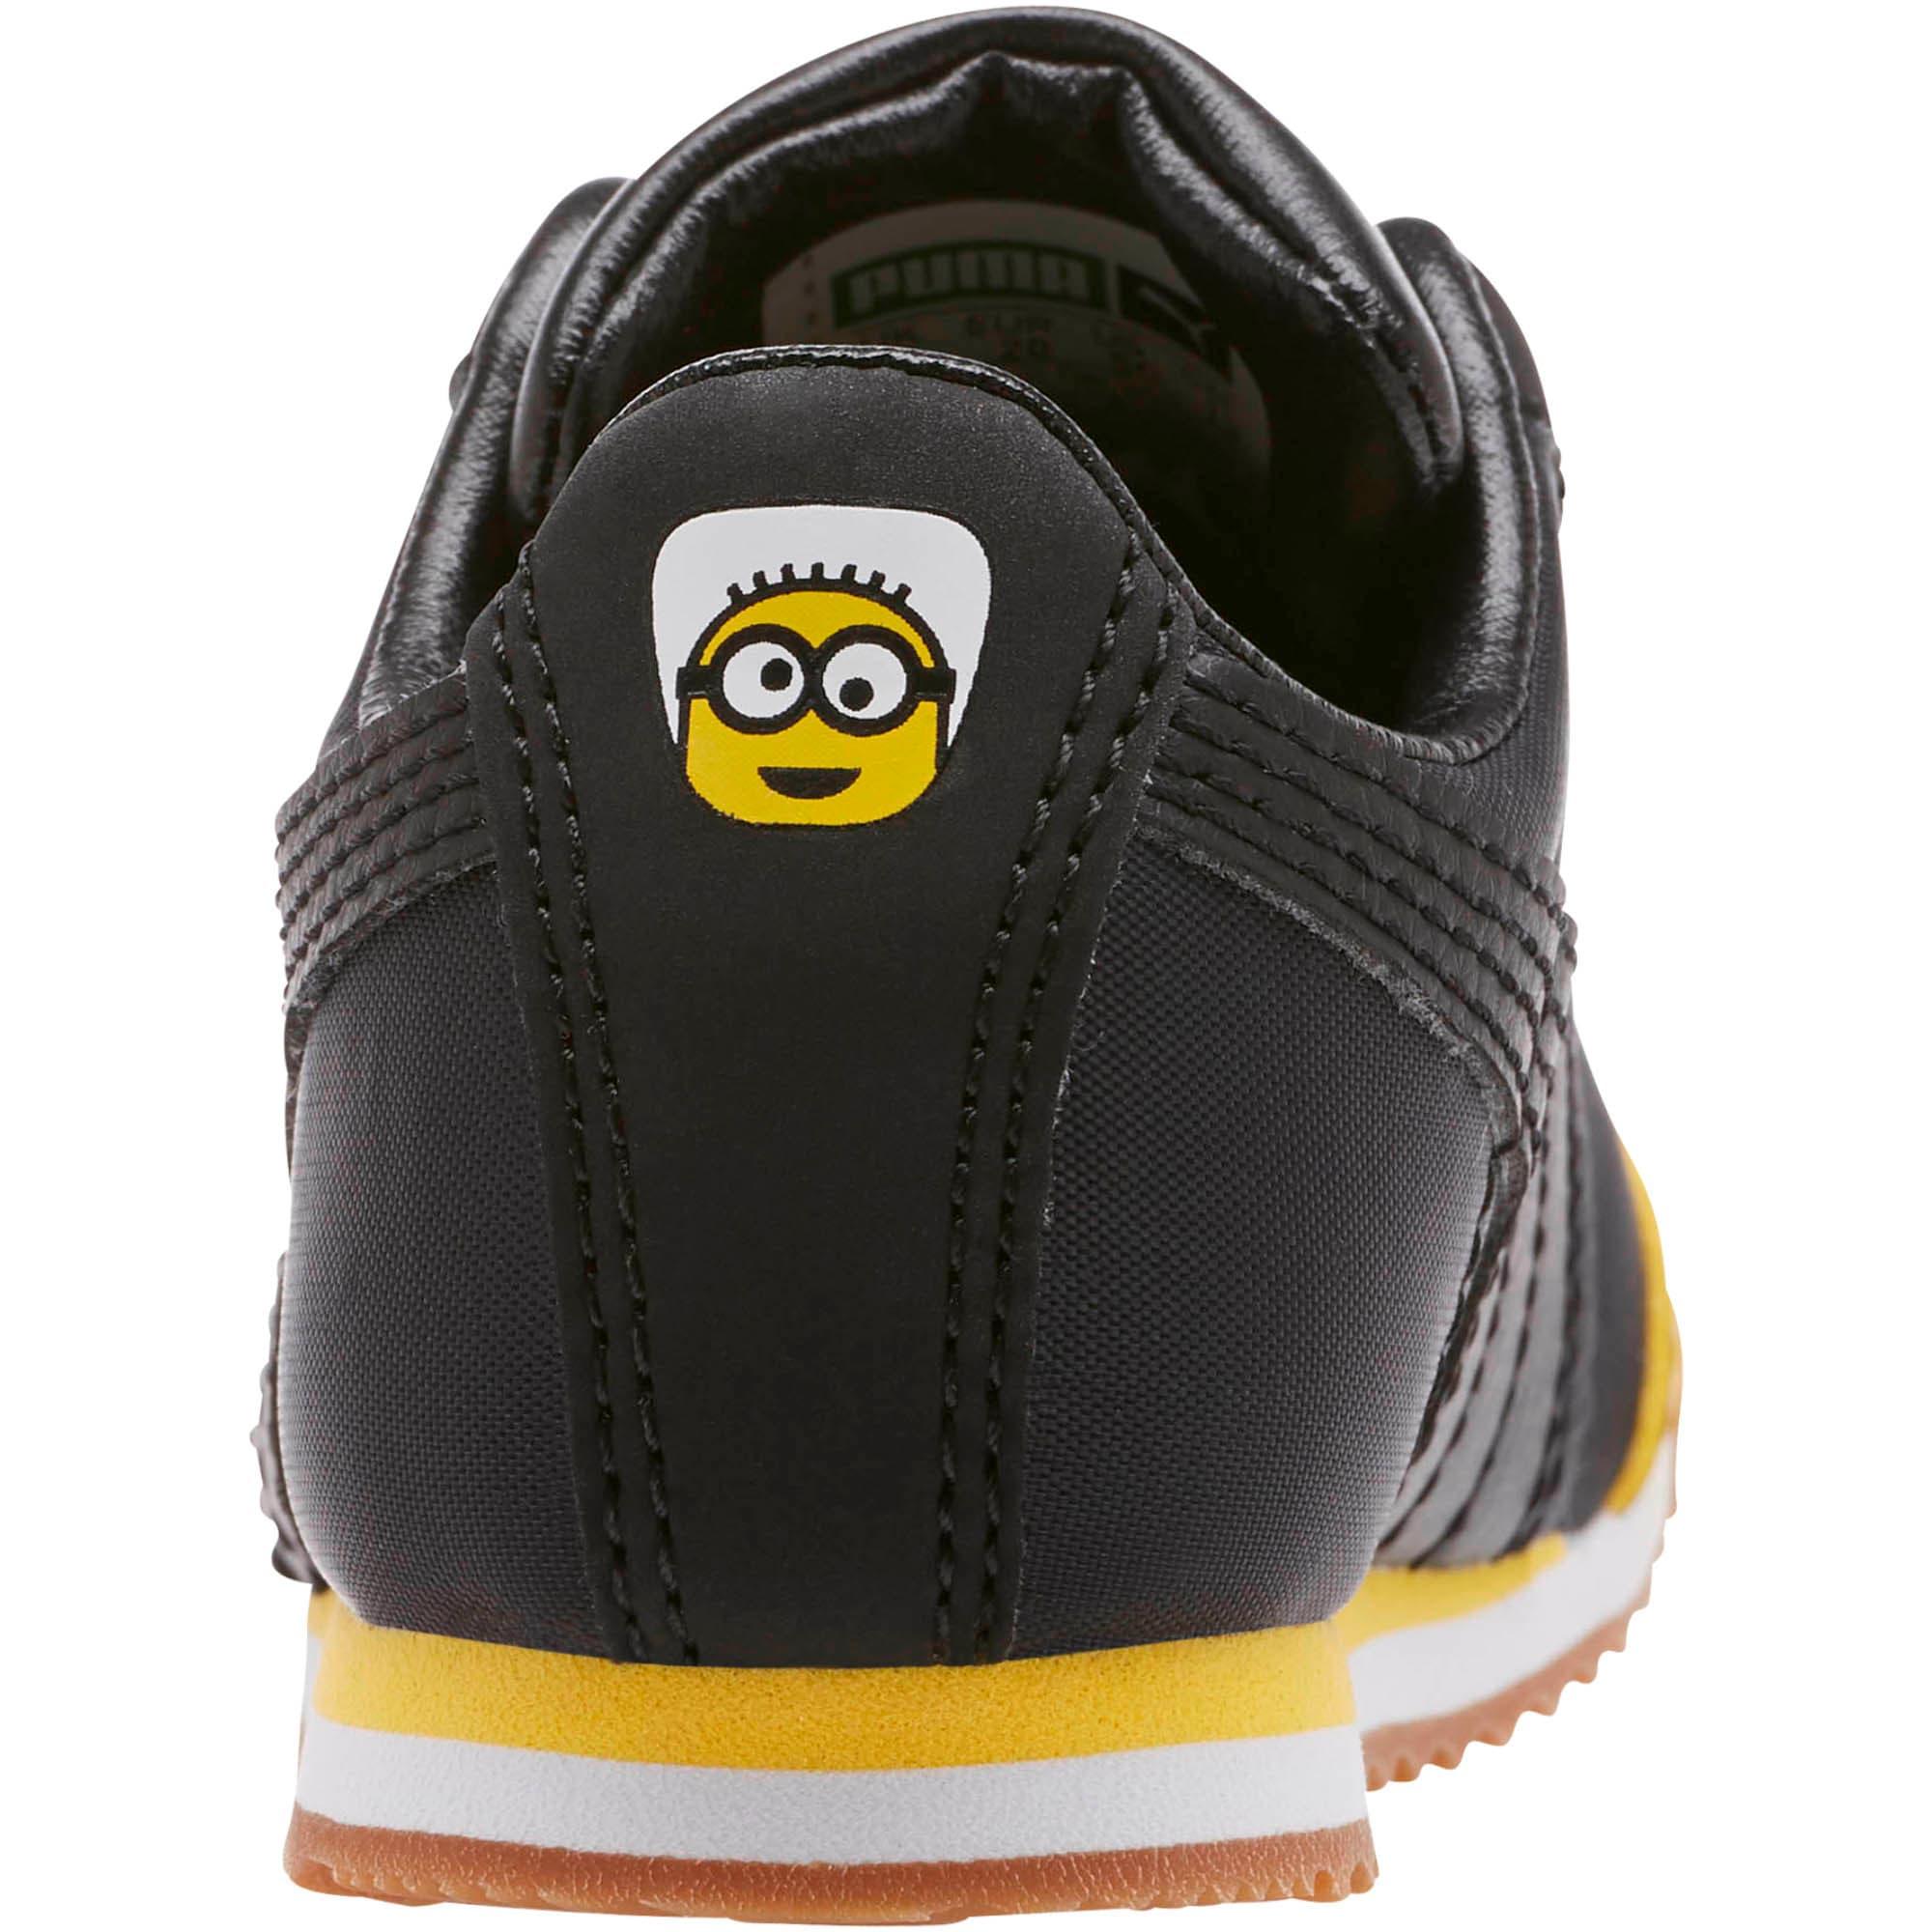 Thumbnail 4 of Minions Roma Toddler Shoes, Black-Minion Yellow-Black, medium